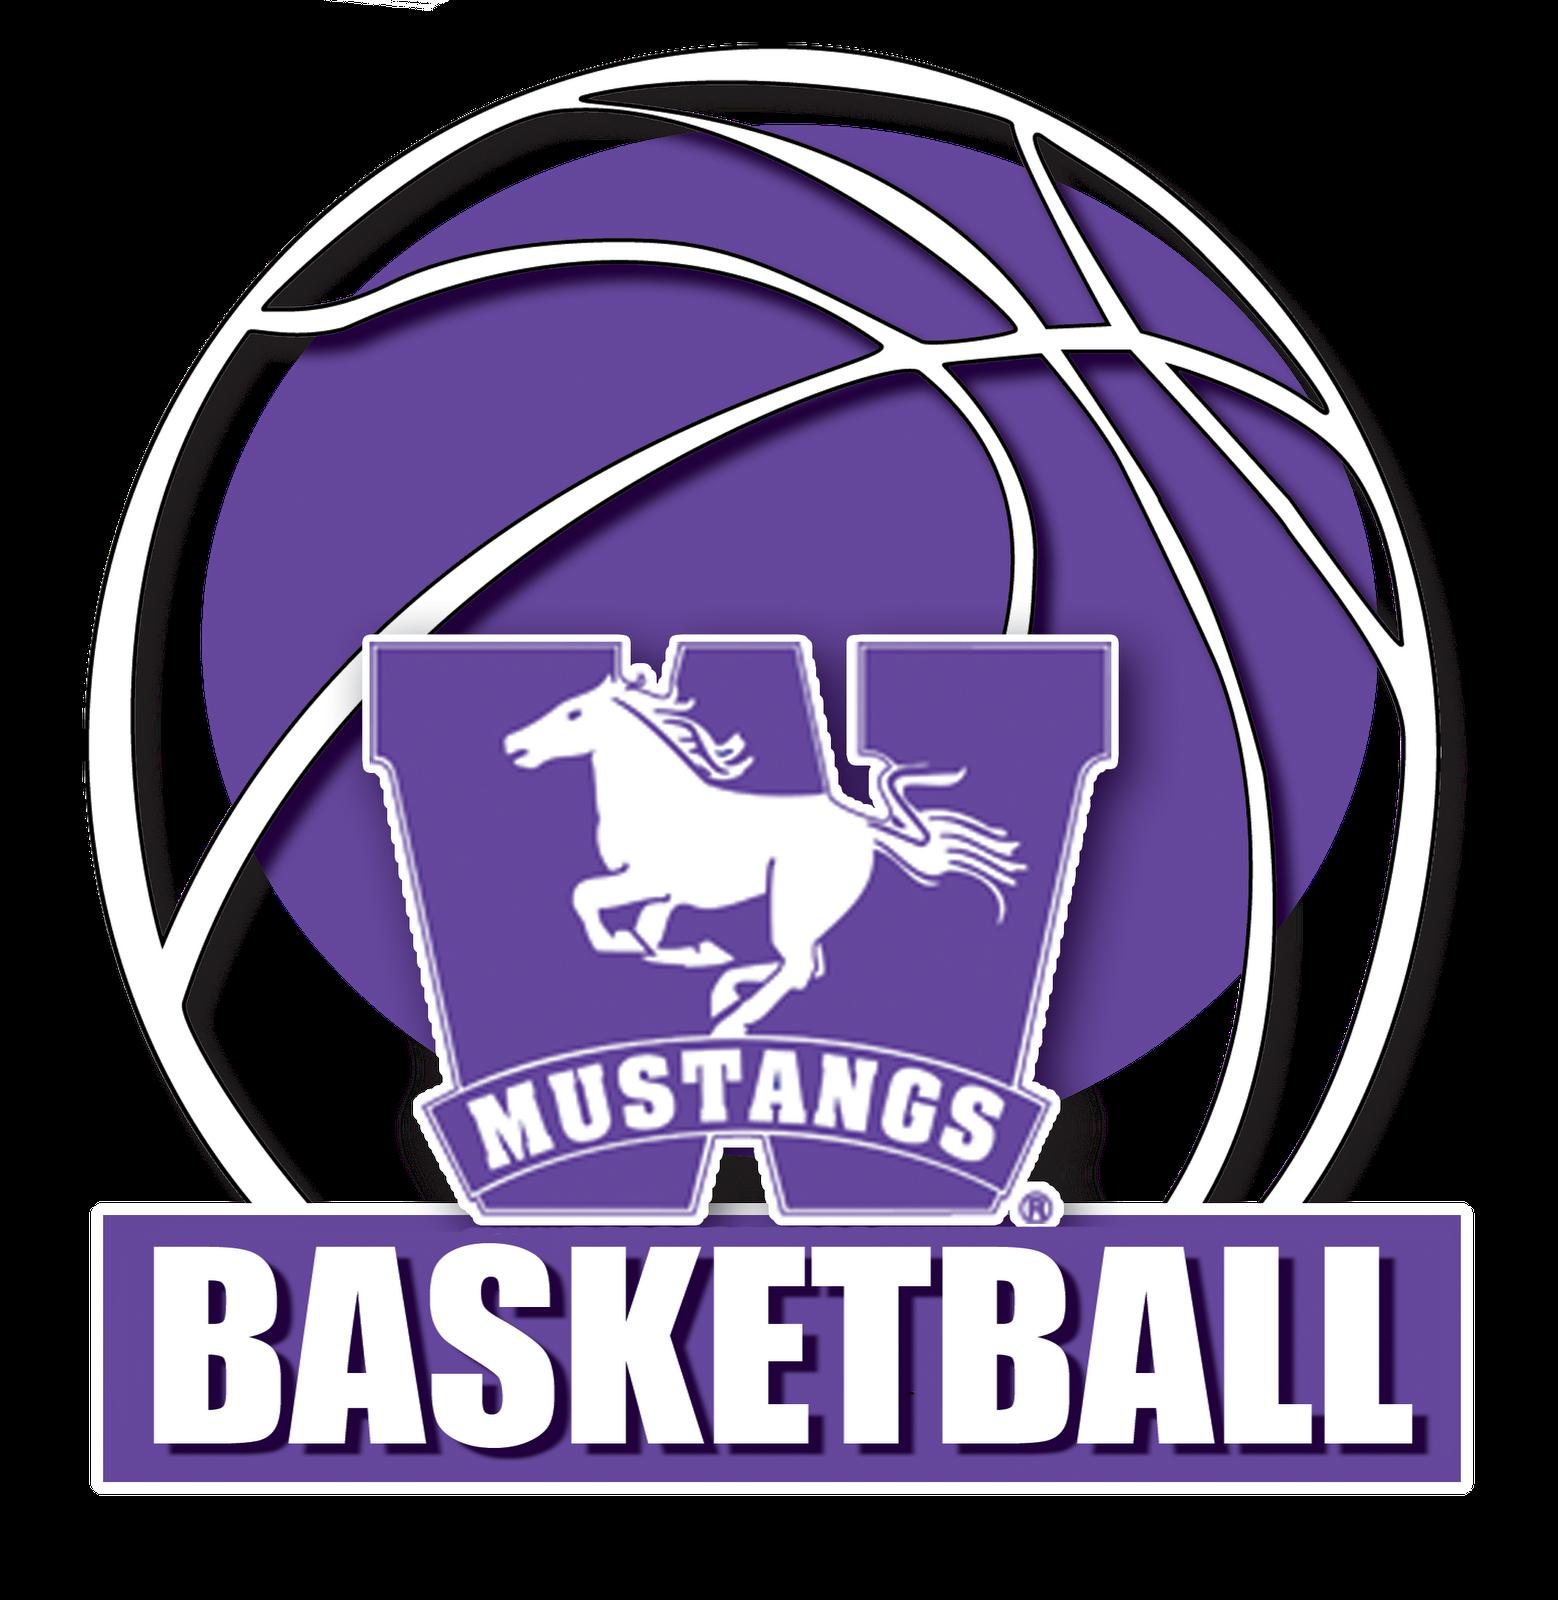 http://1.bp.blogspot.com/_fj4rHo47j9k/TCnwm5c6QCI/AAAAAAAAAVY/53iQd4jyqcM/s1600/Basketball%2BLogo.png